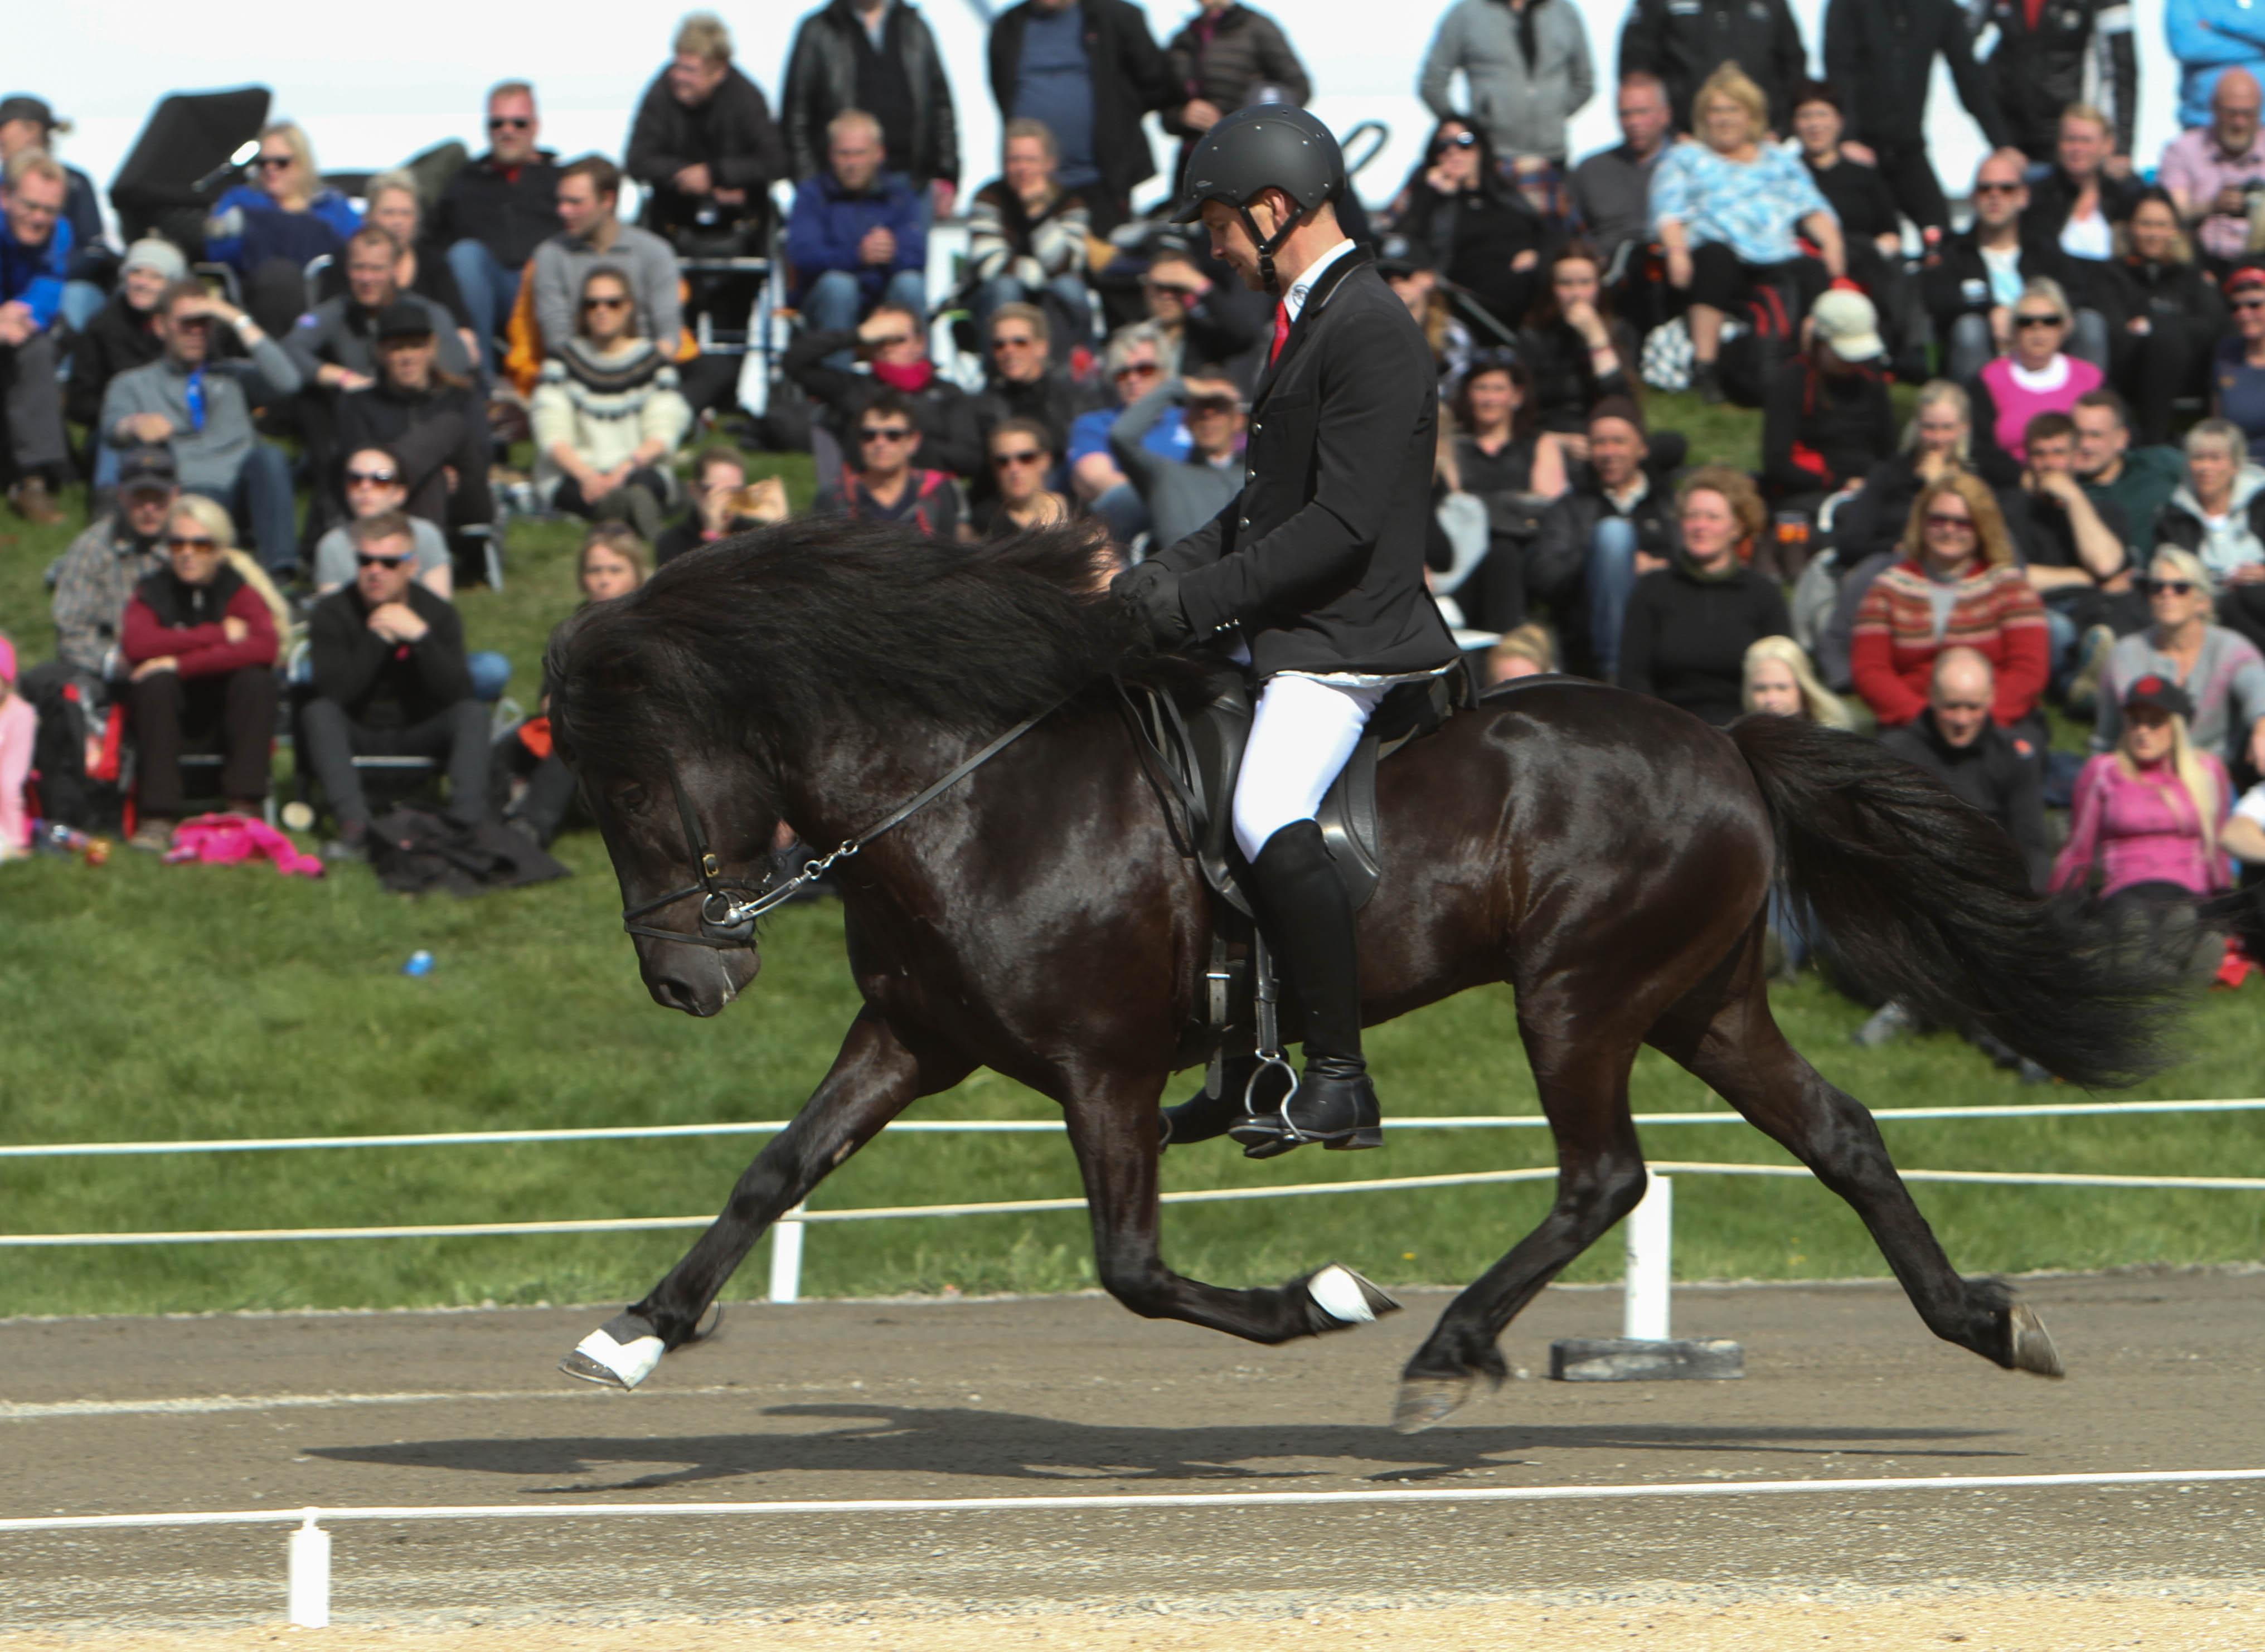 Sjódur frá Kirkjubae i trav, nu på 6:e plats Foto: Karin Cederman/ishestnews.se